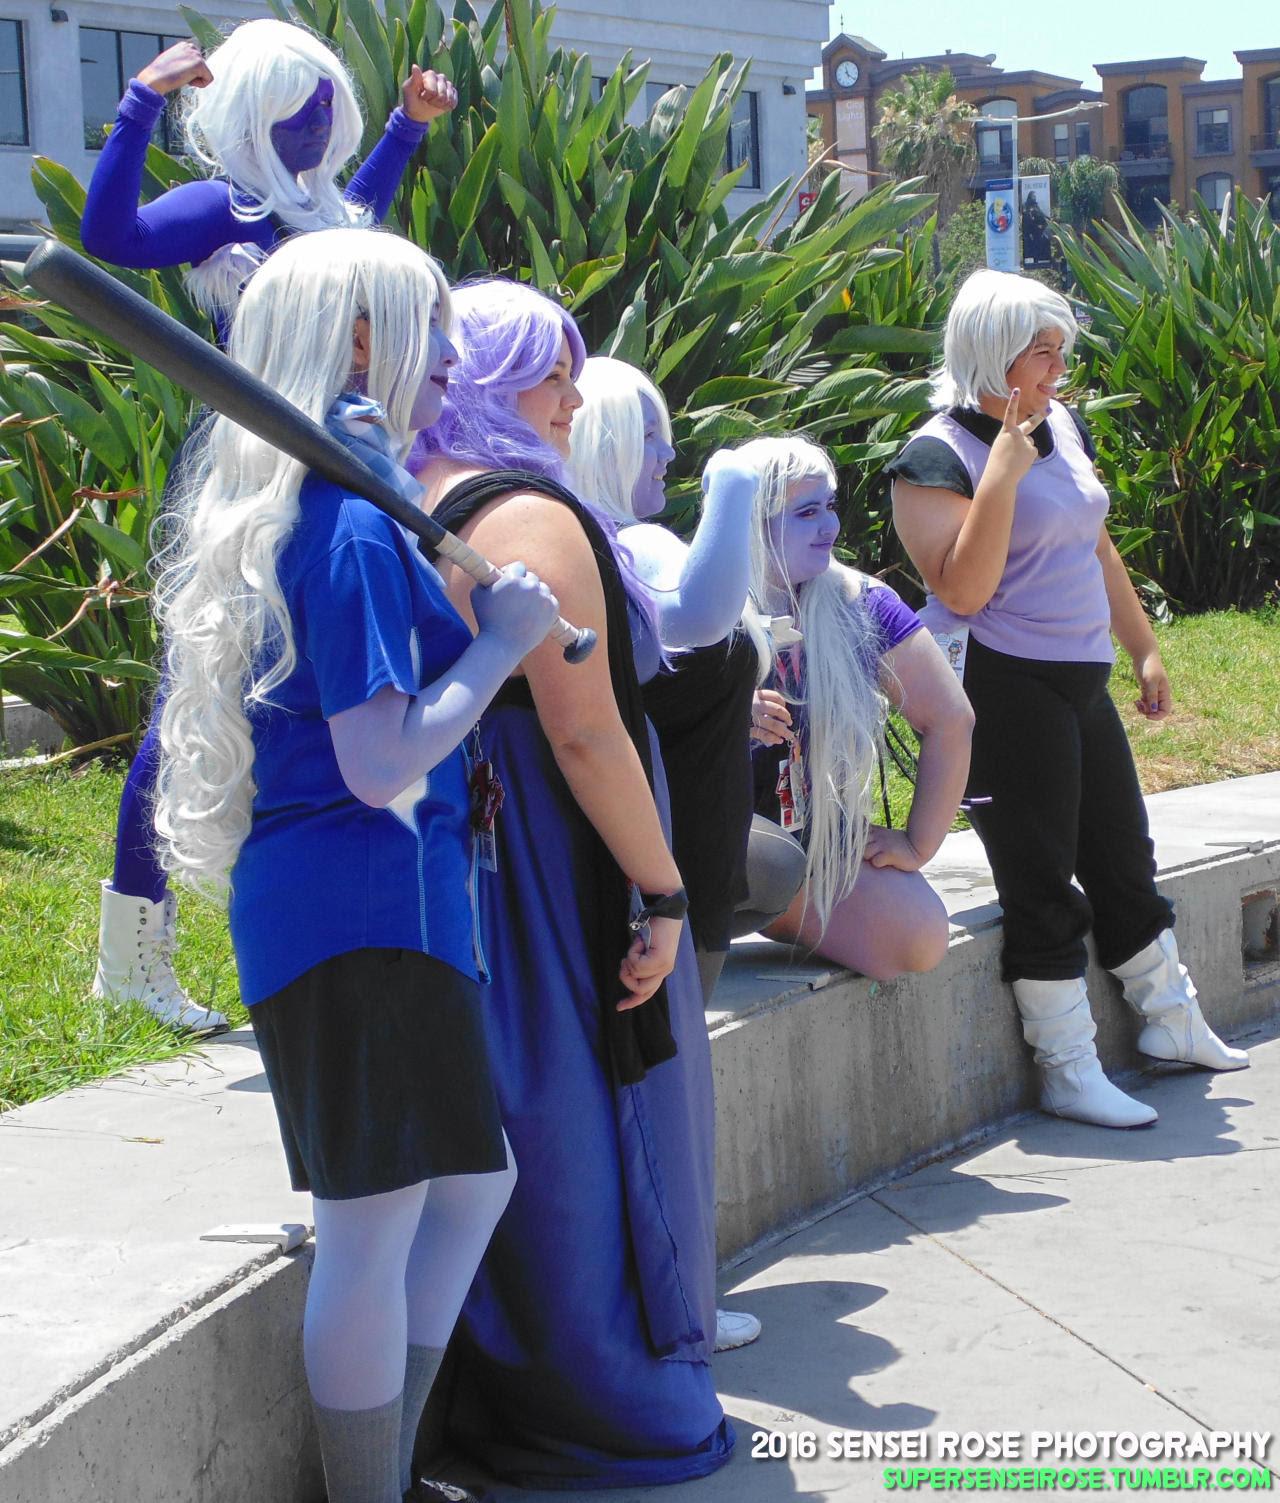 Steven Universe Gathering - AX 2016 (1 of 2)